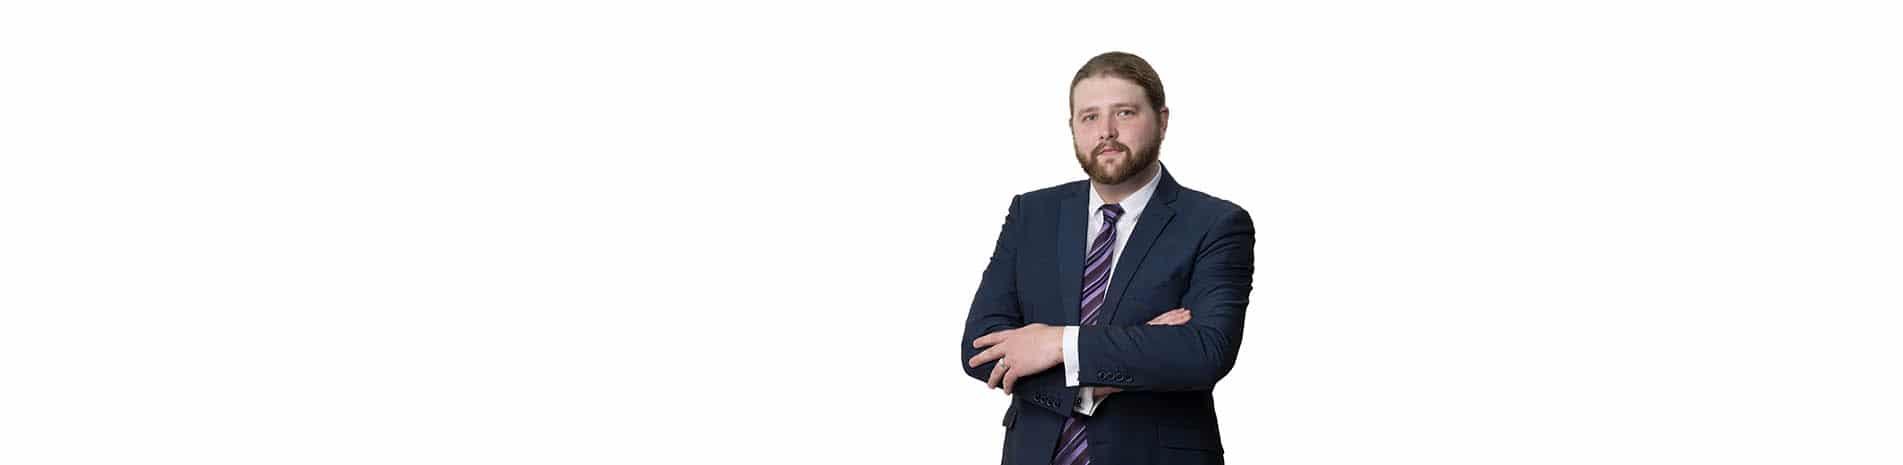 Ryan Robertson Traffic Lawyer Melbourne